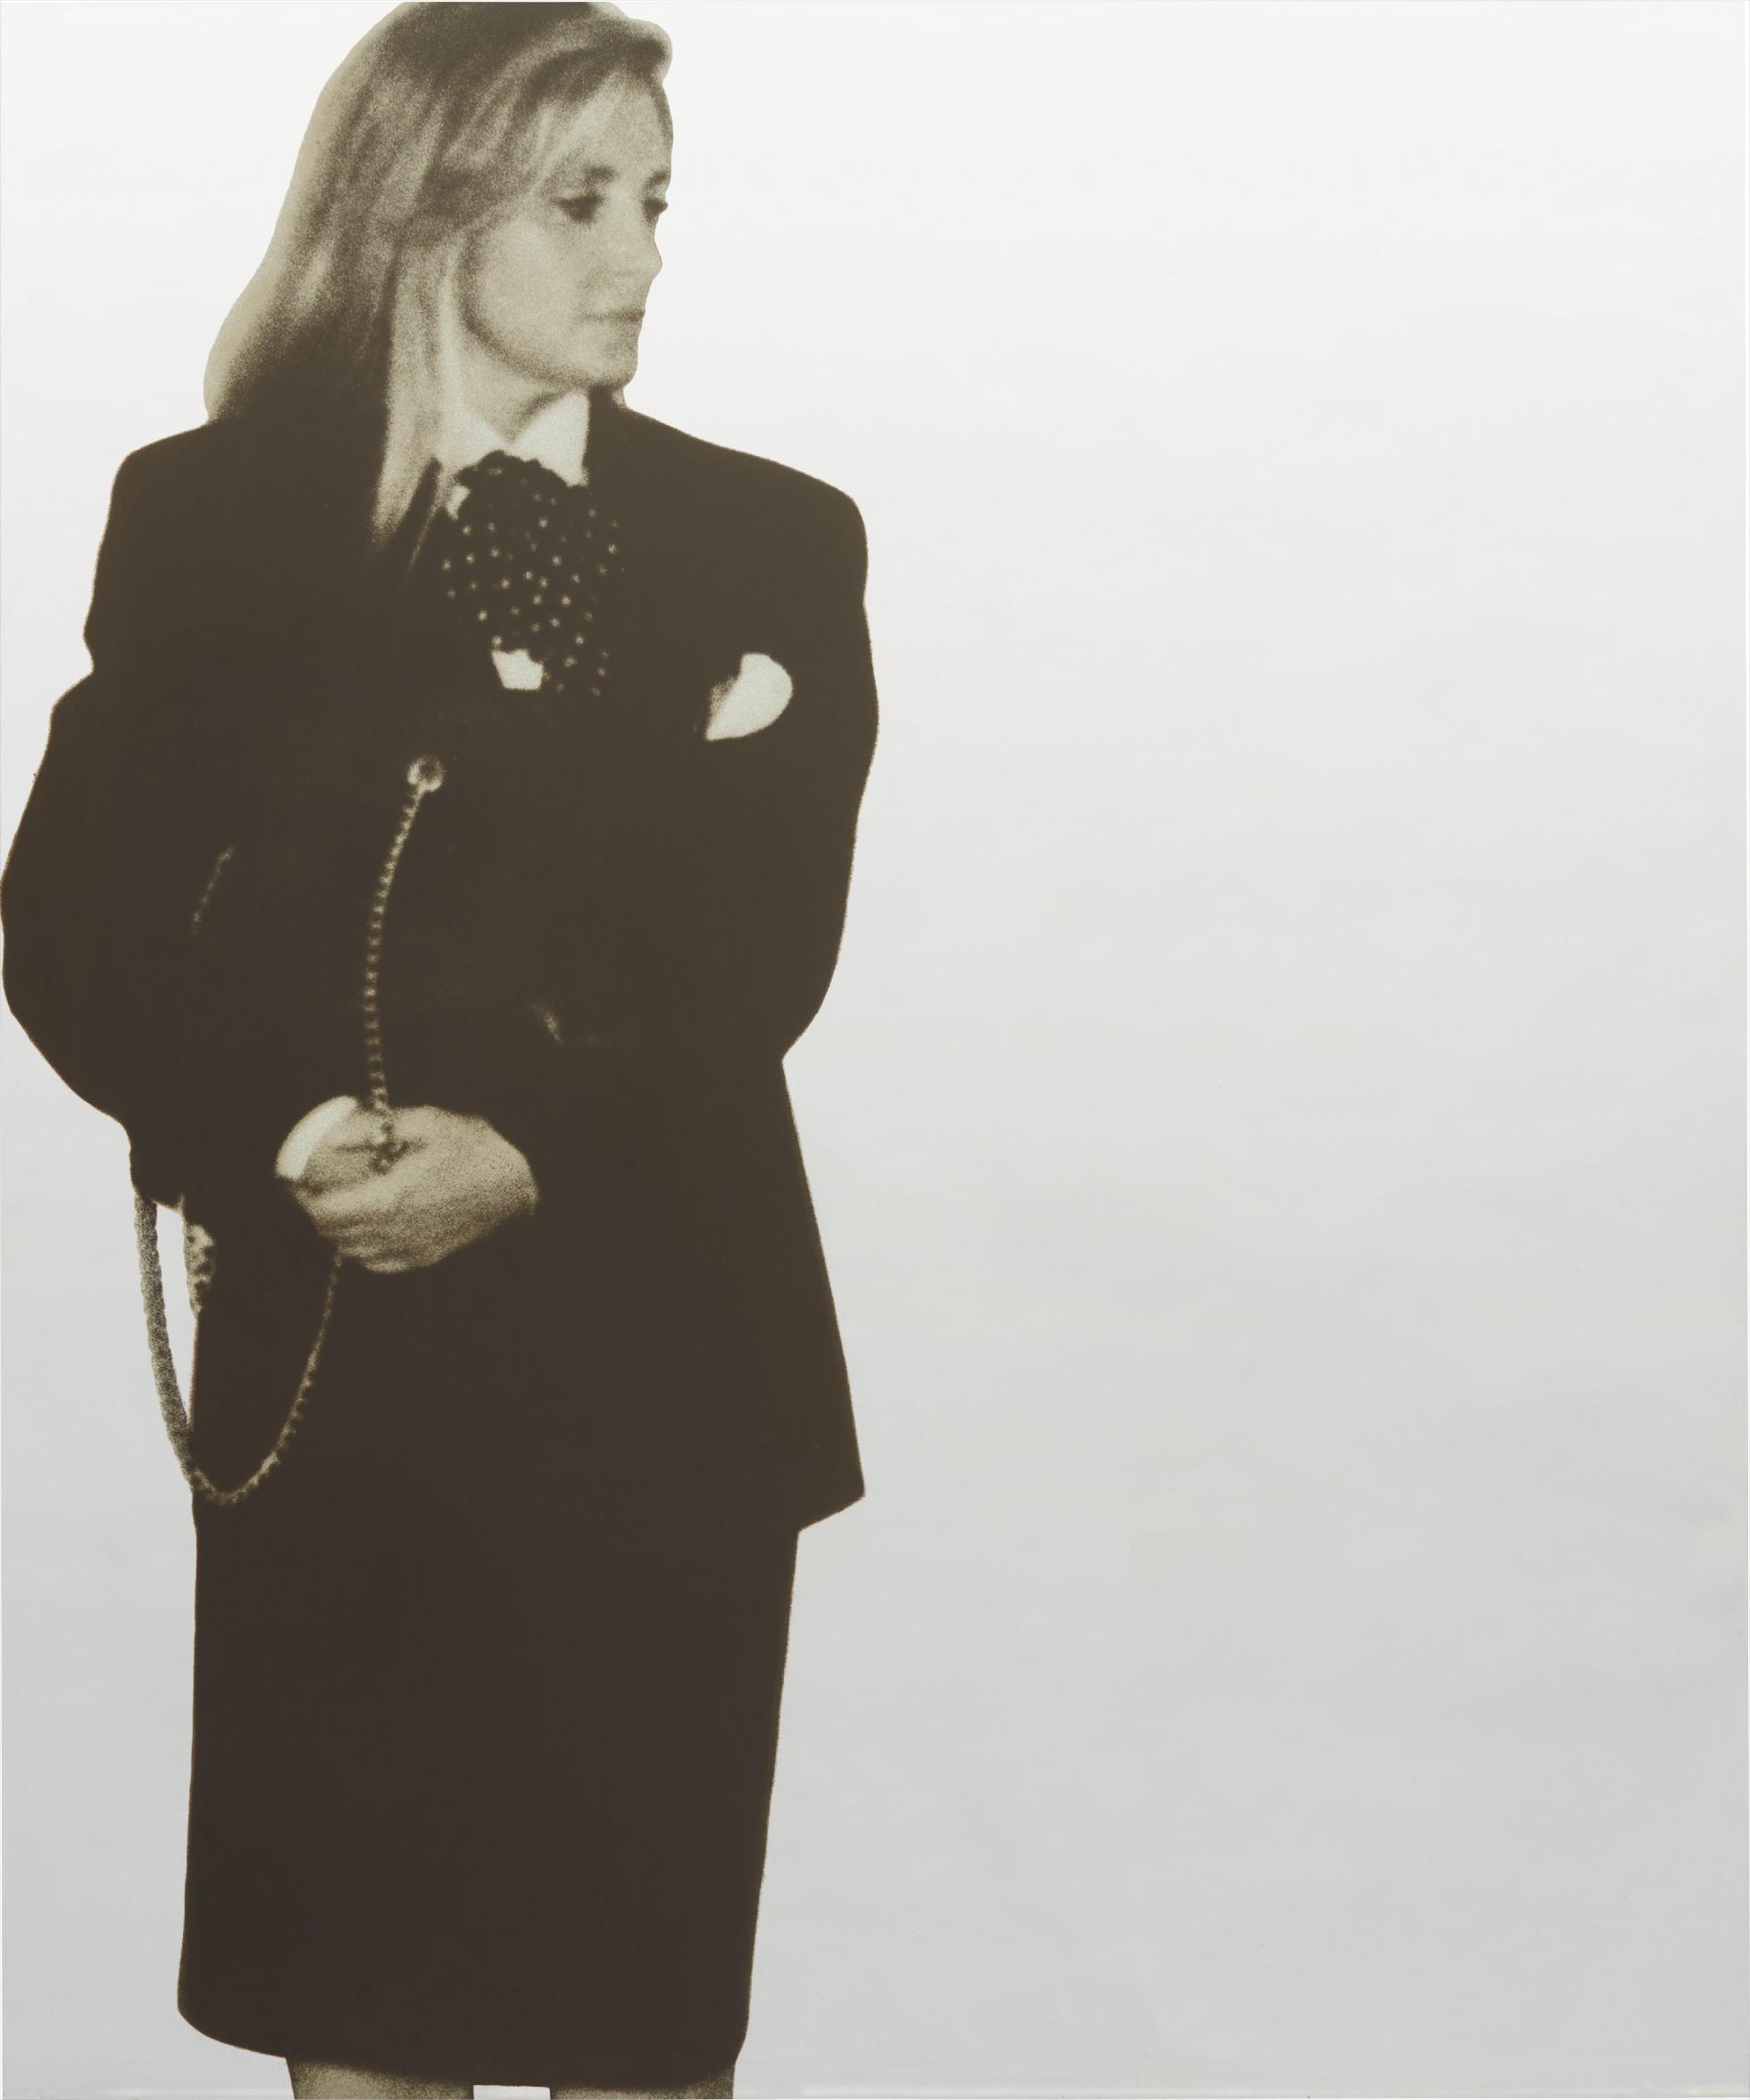 Michelangelo Pistoletto-Gabriella-1987